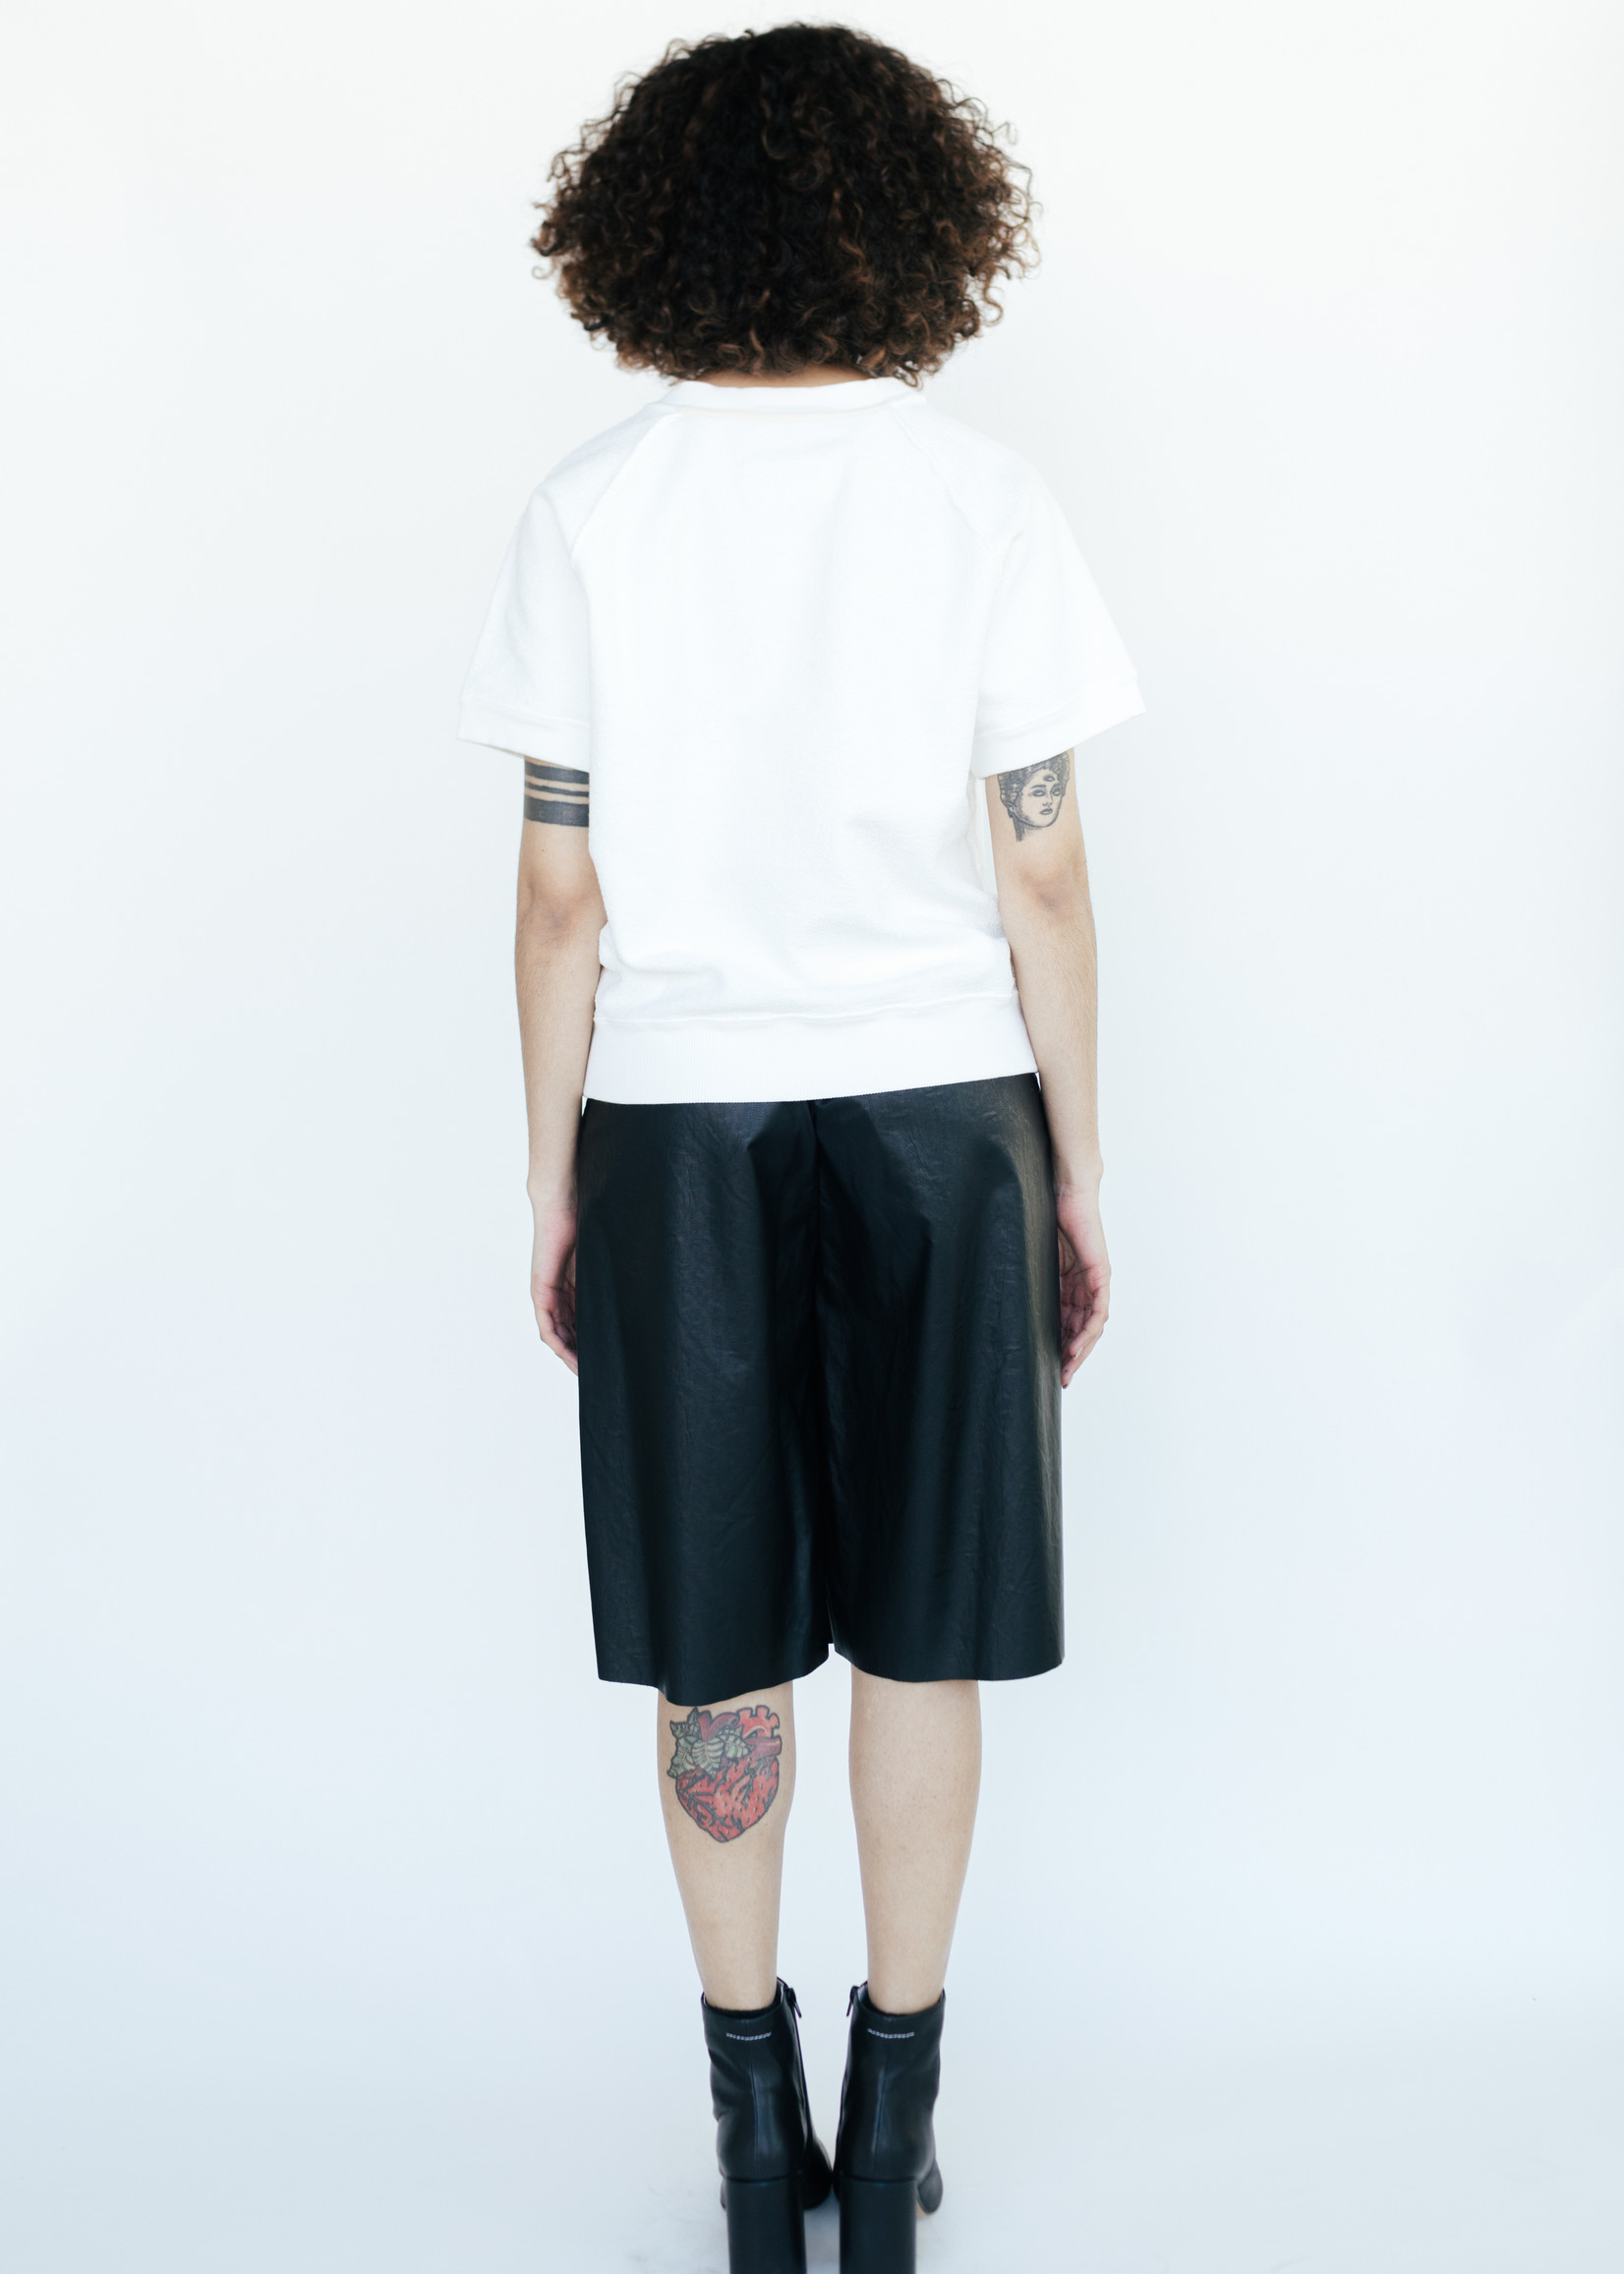 MM6 MAISON MARGIELA Studio Graphic Sweatshirt in White